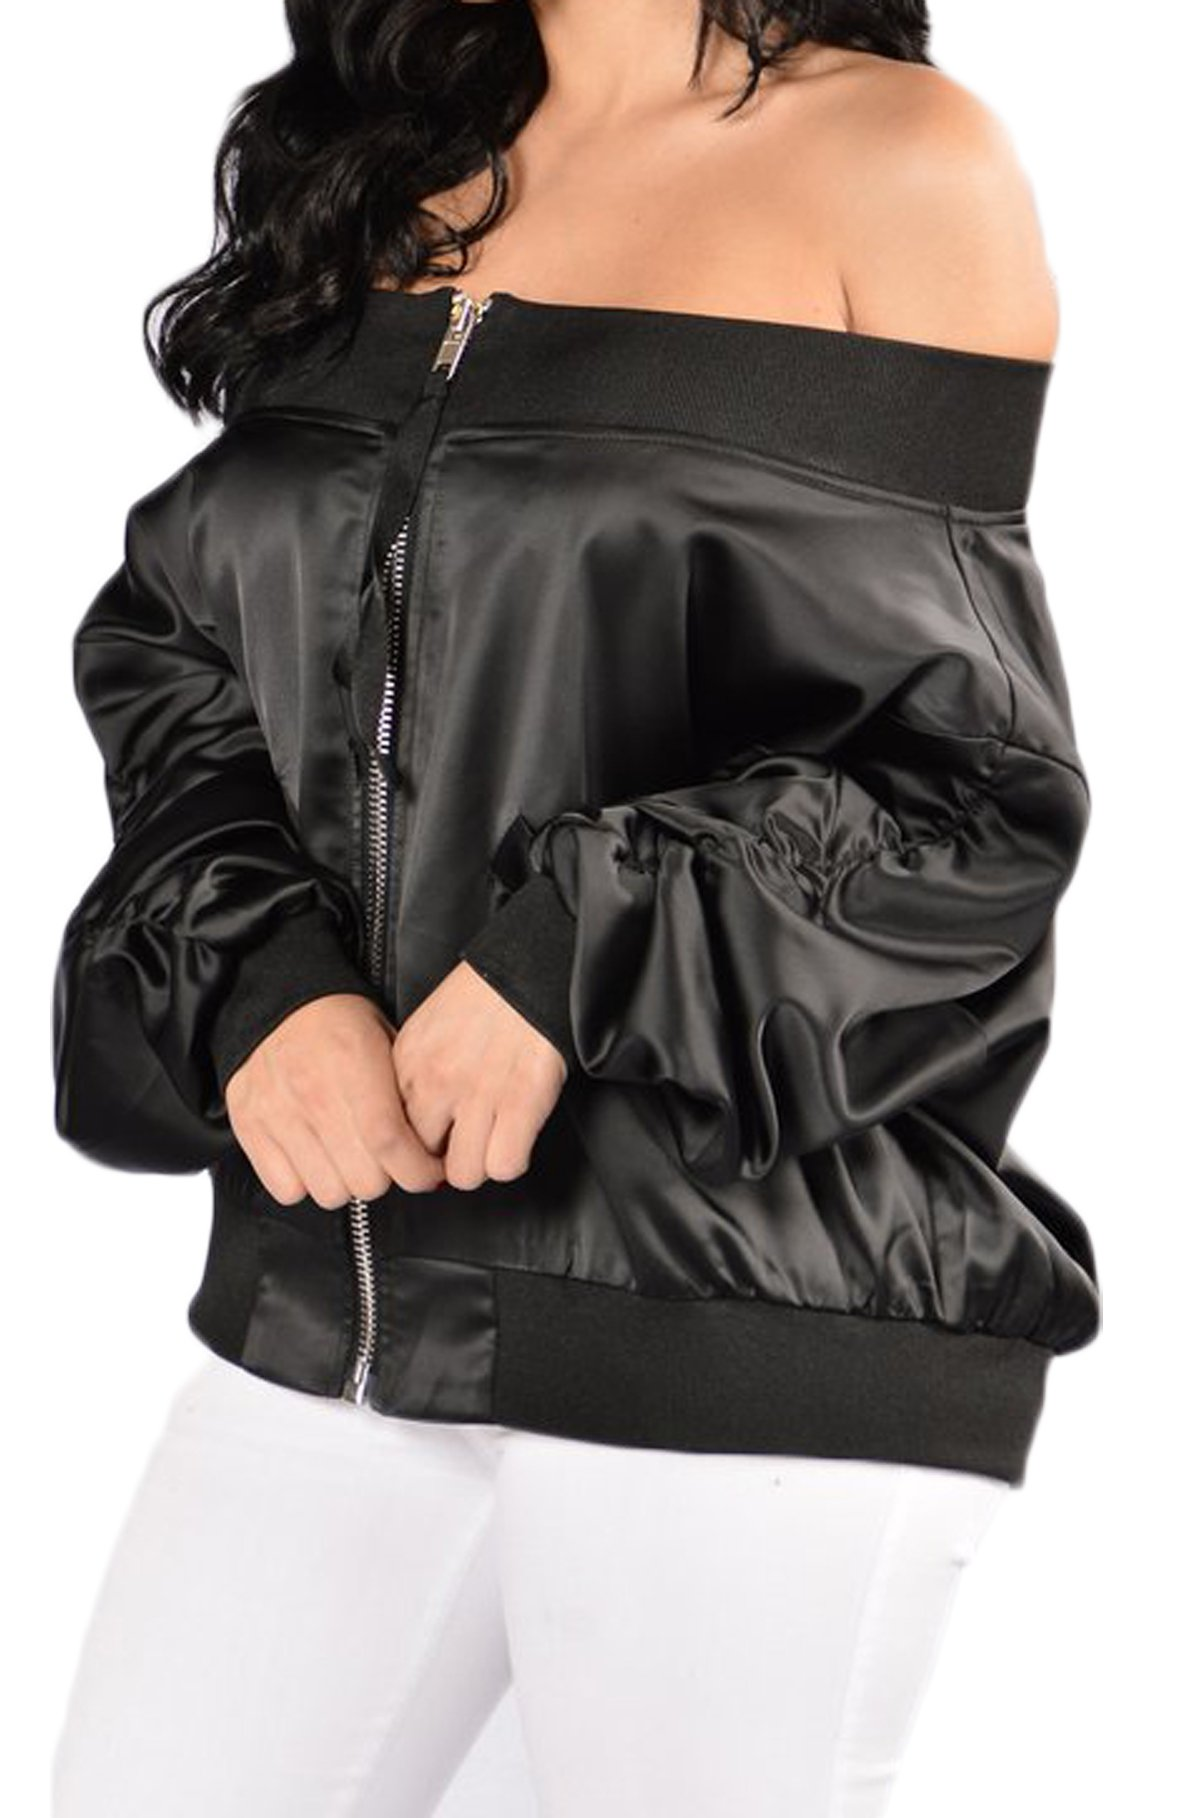 Farktop Women's Embroidery Patch Velvet Classic Biker Quilted Bomber Flight Jacket (S, Black-5)